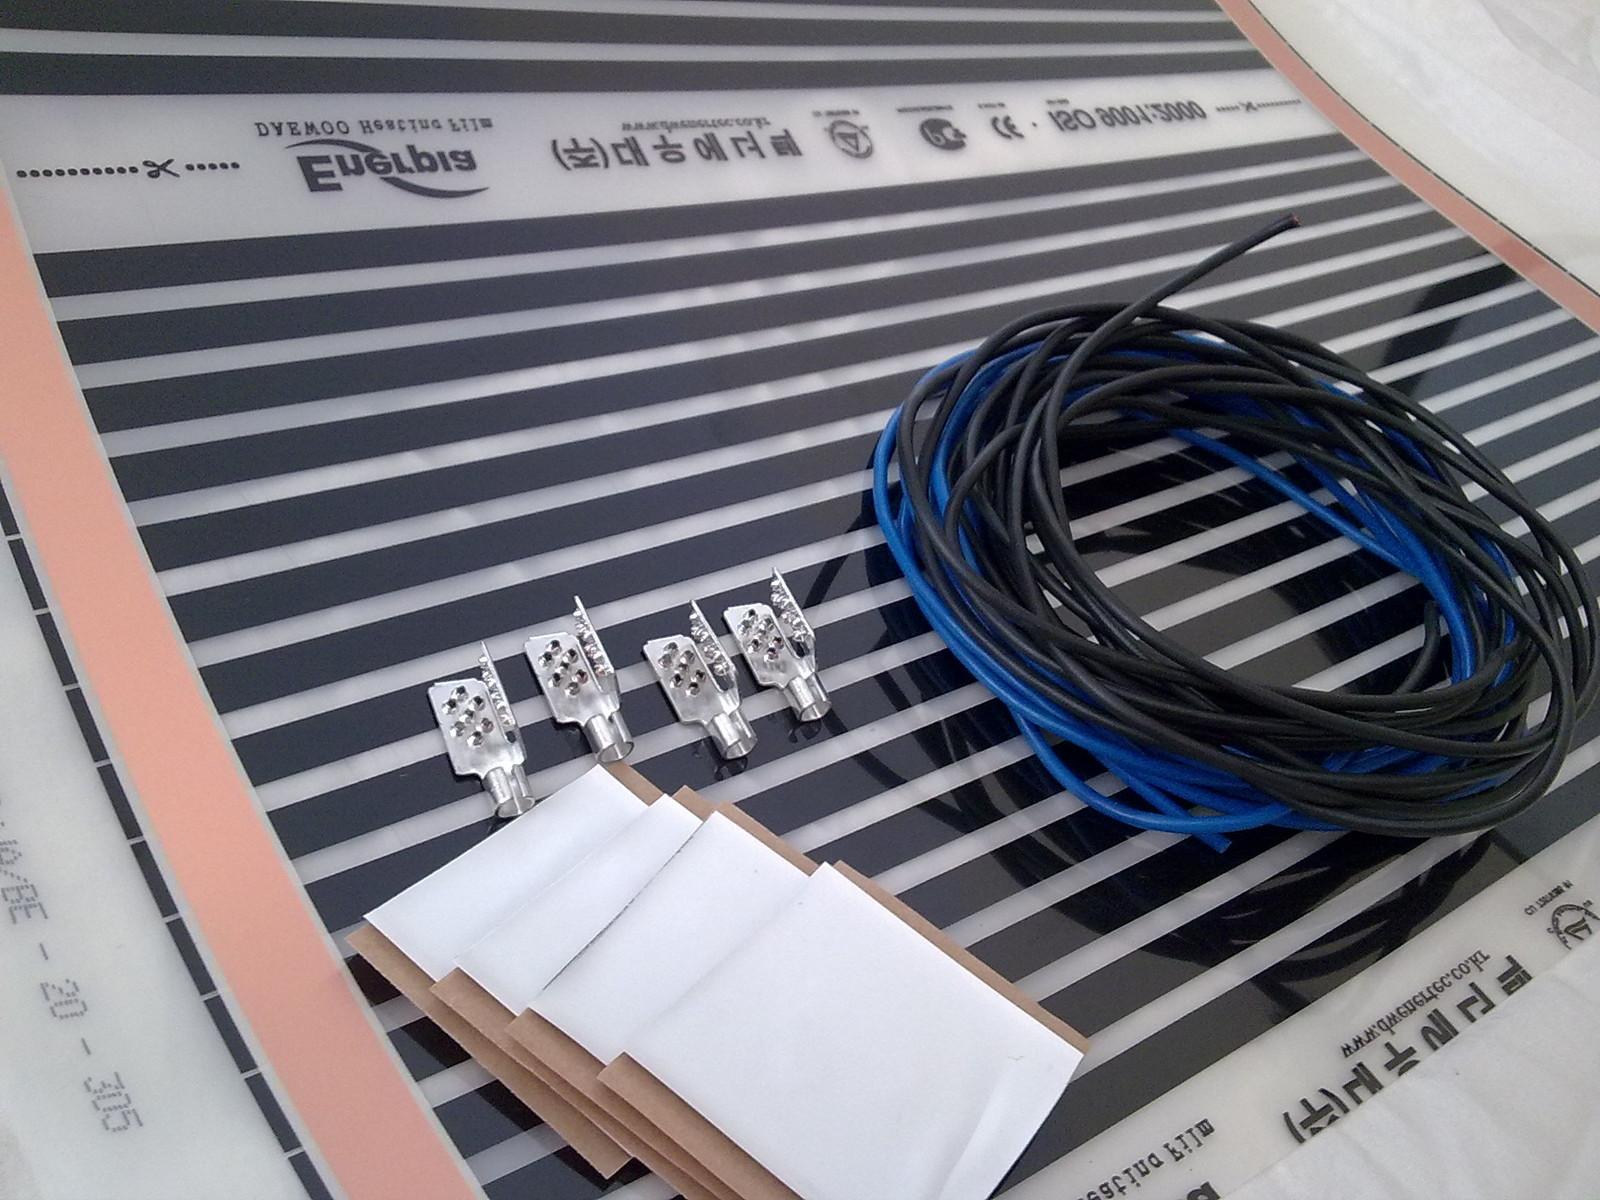 Enerpia heating film 15 sq.m 220 Watts/sq.m 210 240V production  #8C4D3F